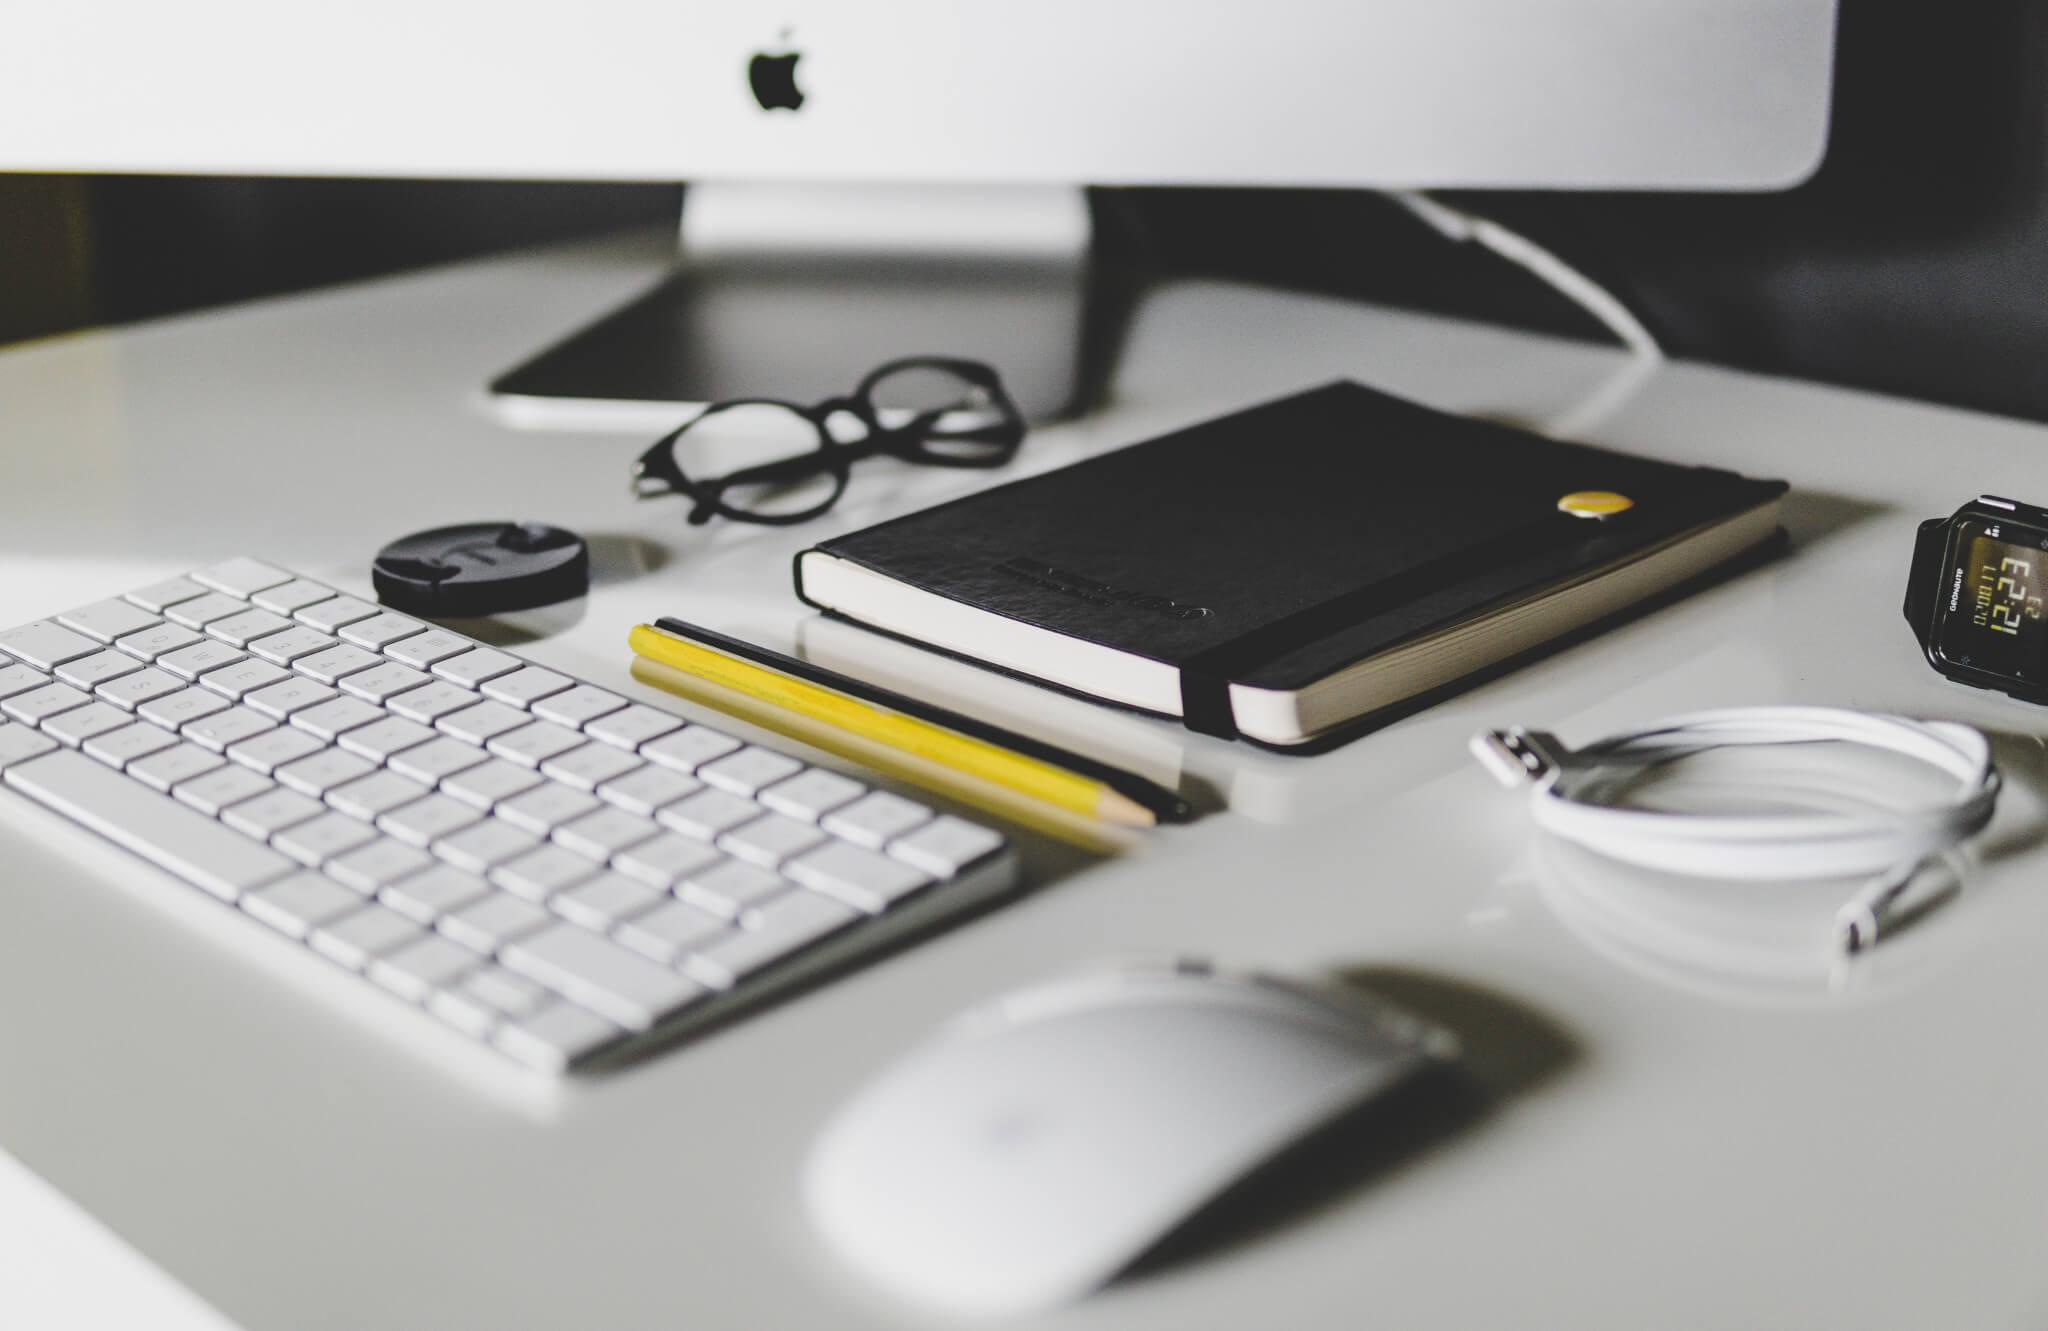 packhelp-article-onboarding-desk